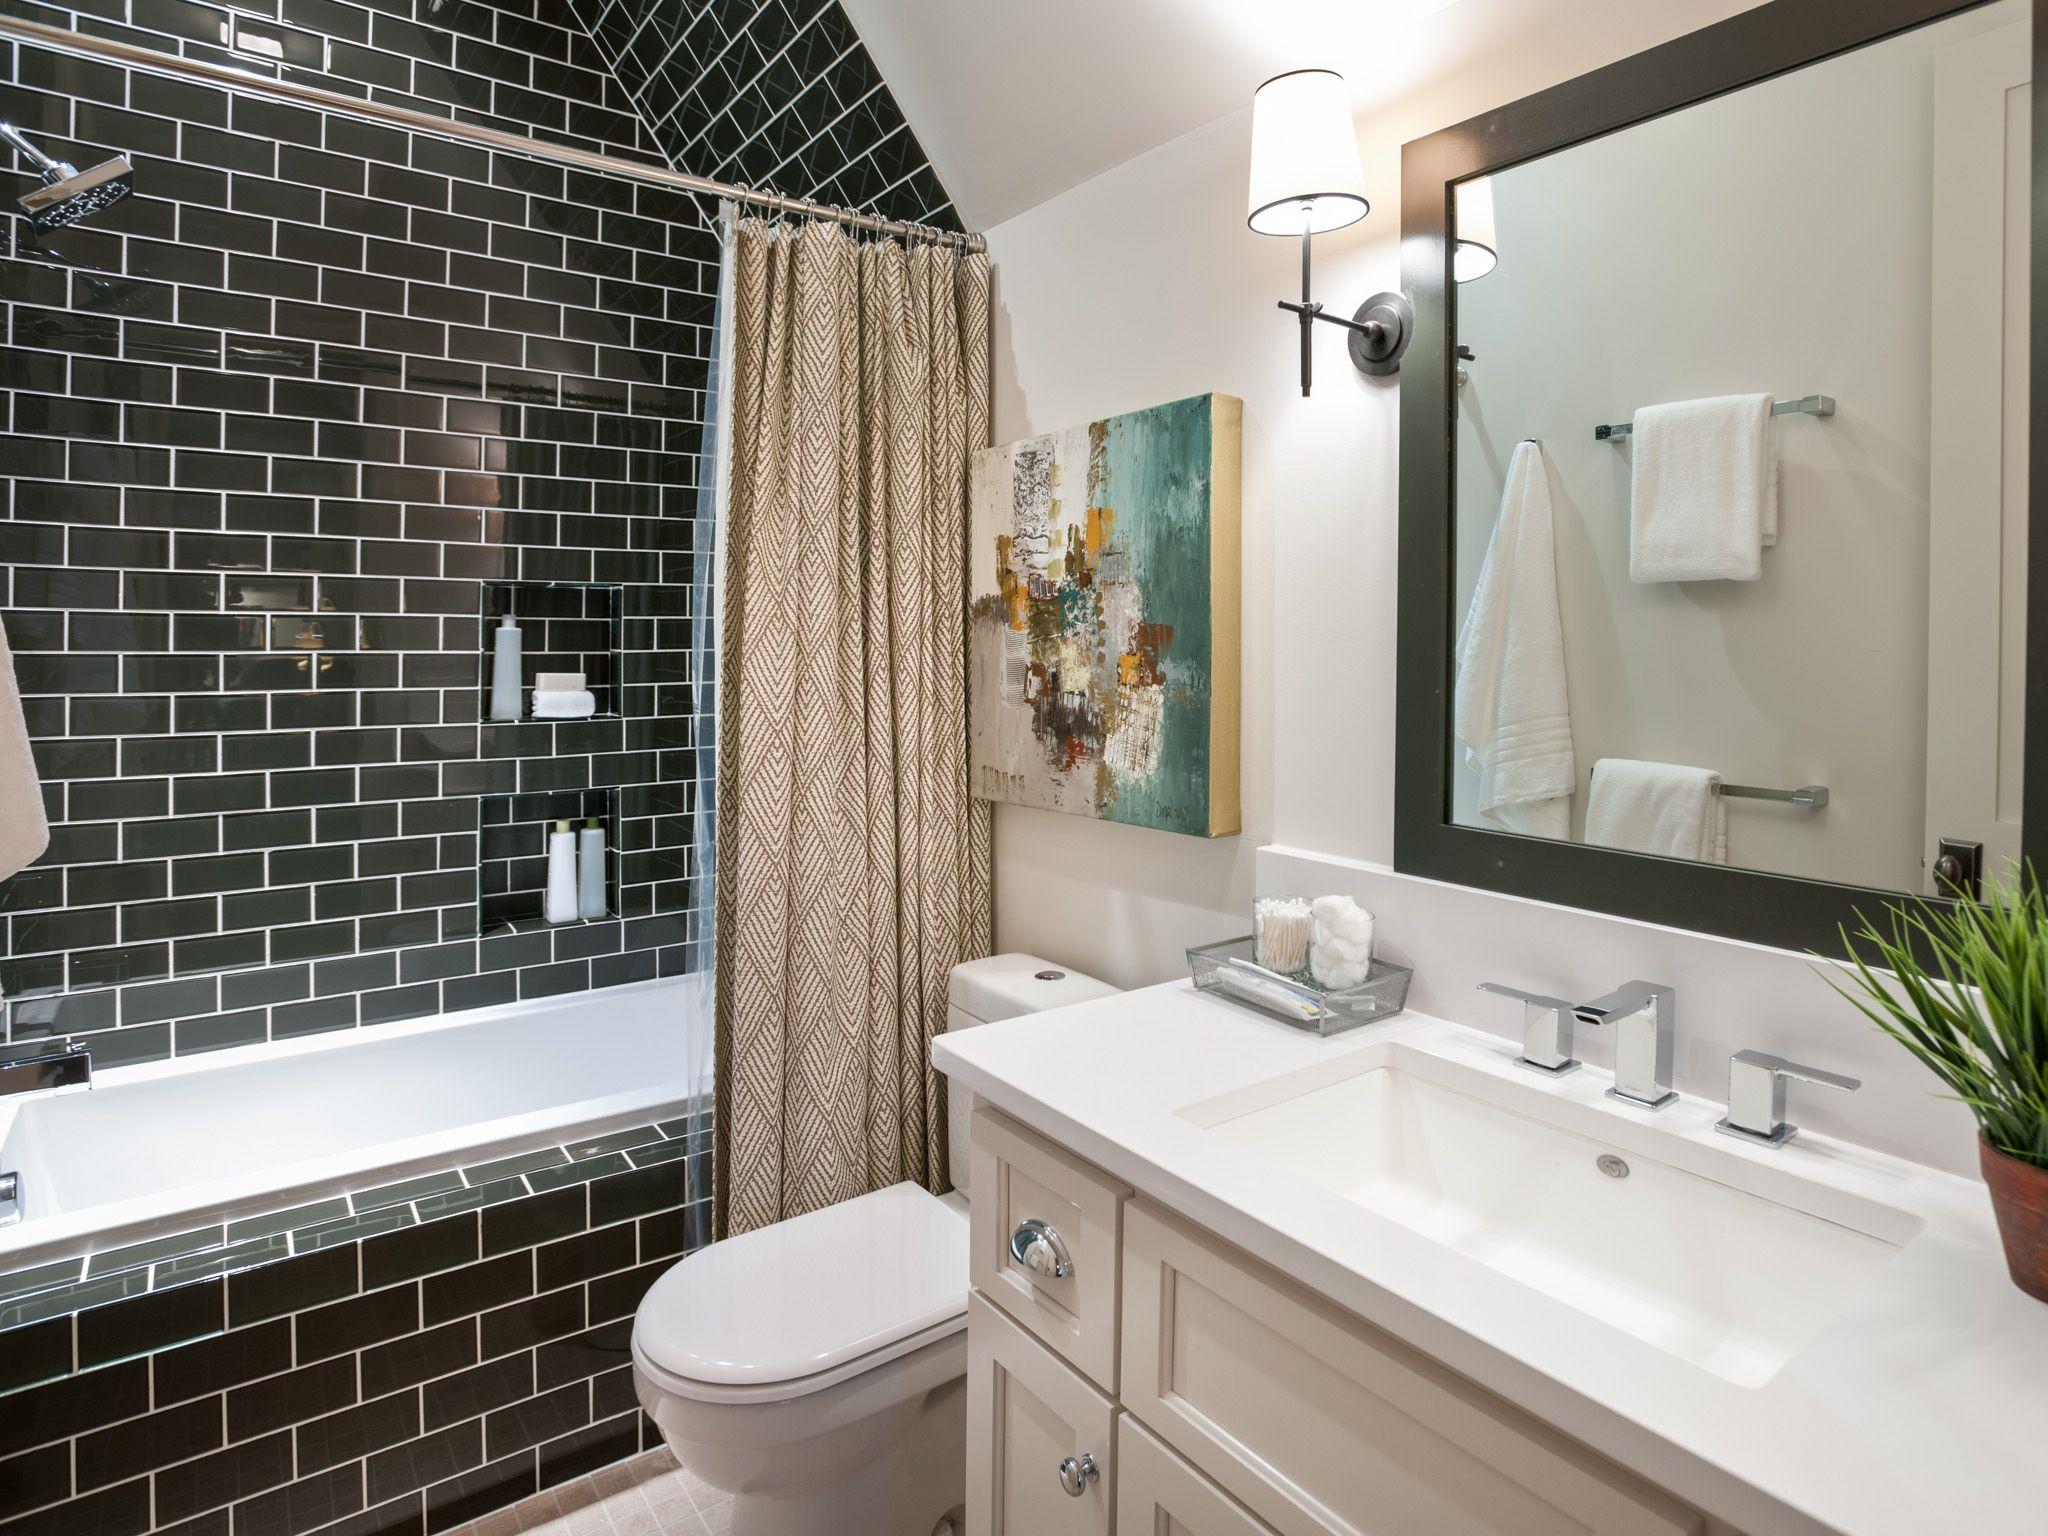 Bathroom Remodel Videos hgtv bathroom remodel. hgtv bathroom remodel videos on sich